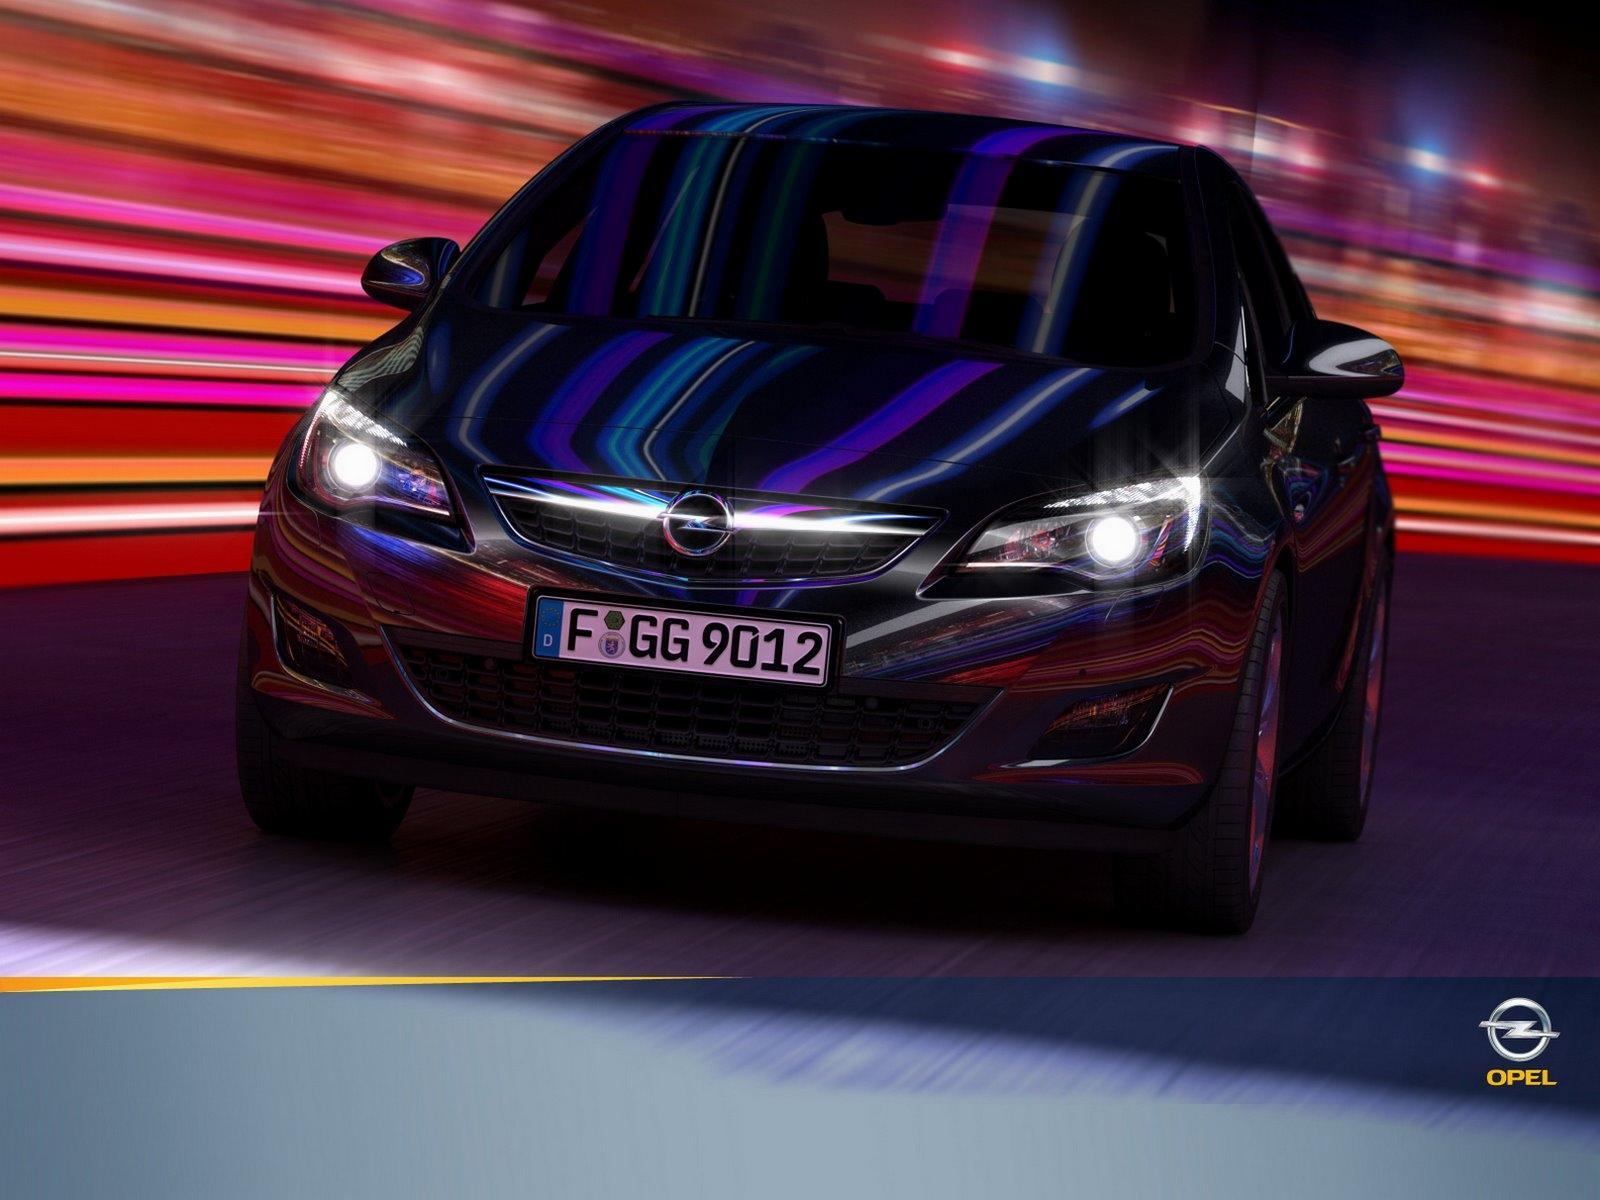 Opel Astra Wallpaper 12   1600 X 1200 stmednet 1600x1200